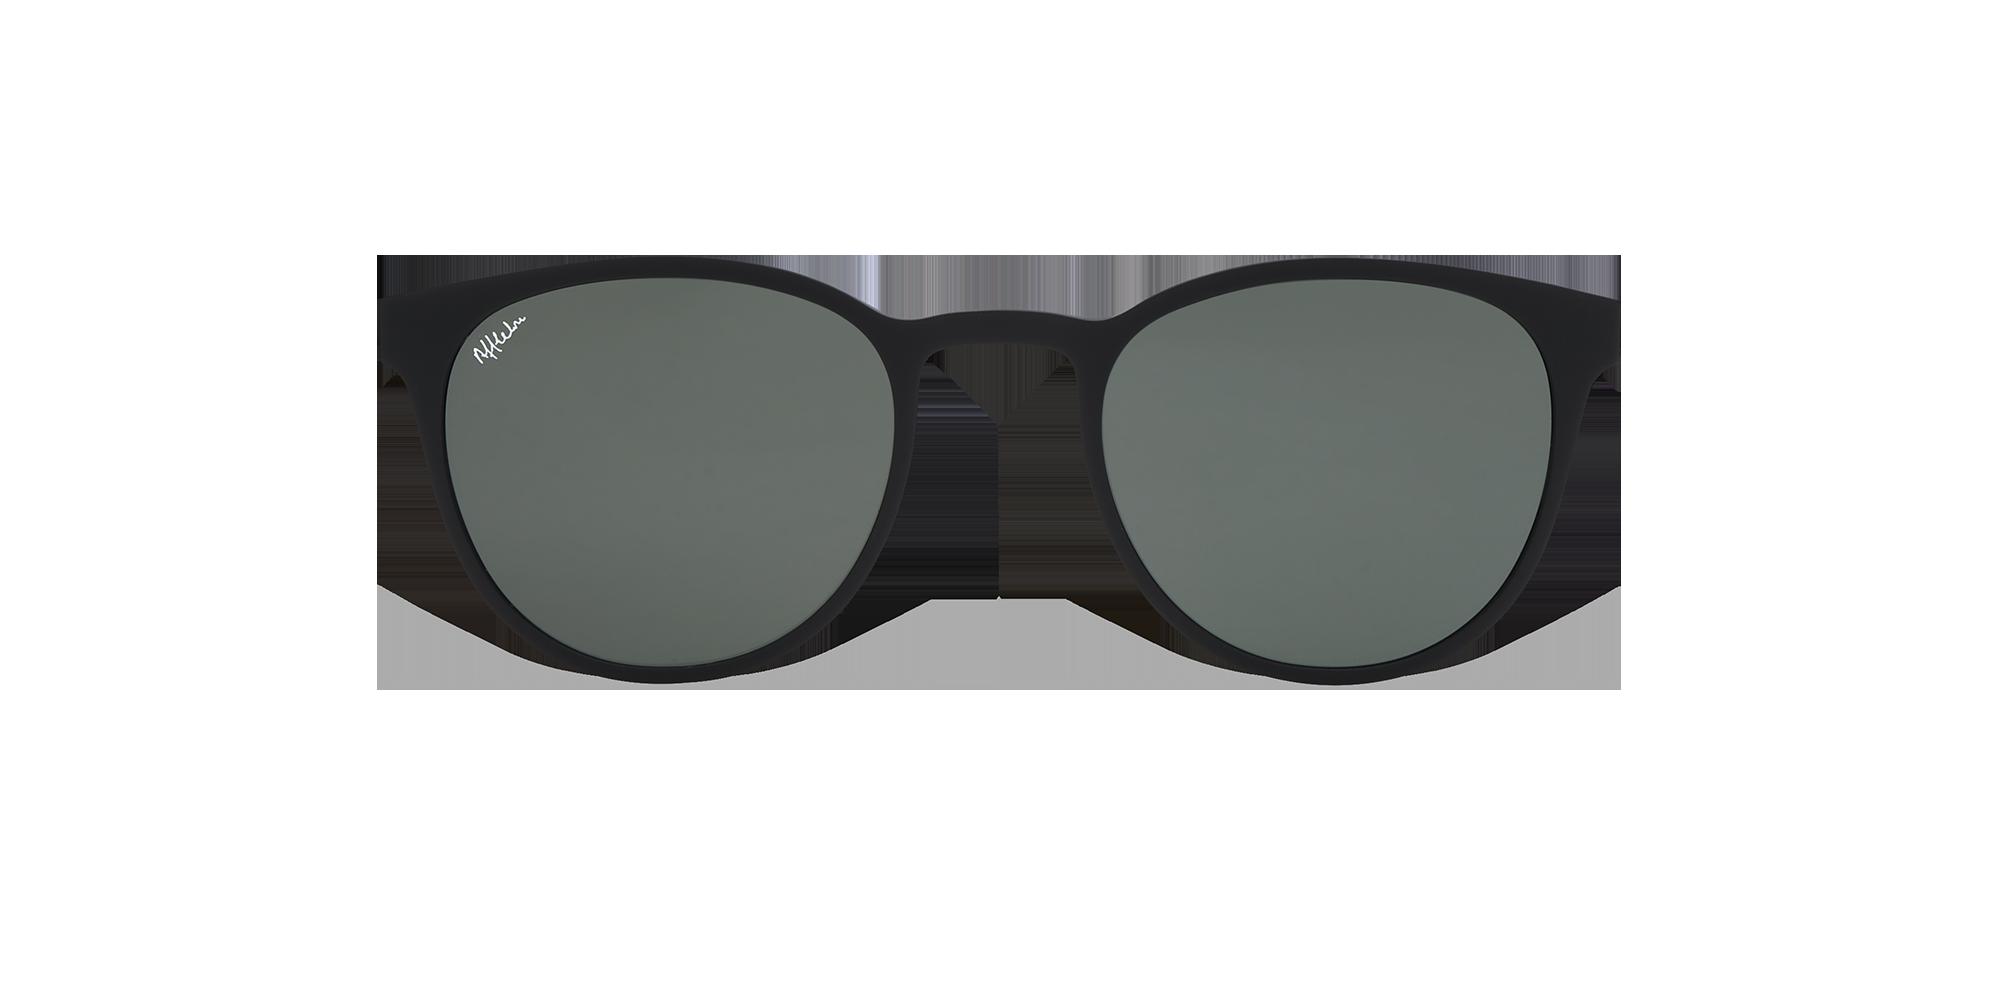 afflelou/france/products/smart_clip/clips_glasses/TMK44SUBK014920.png